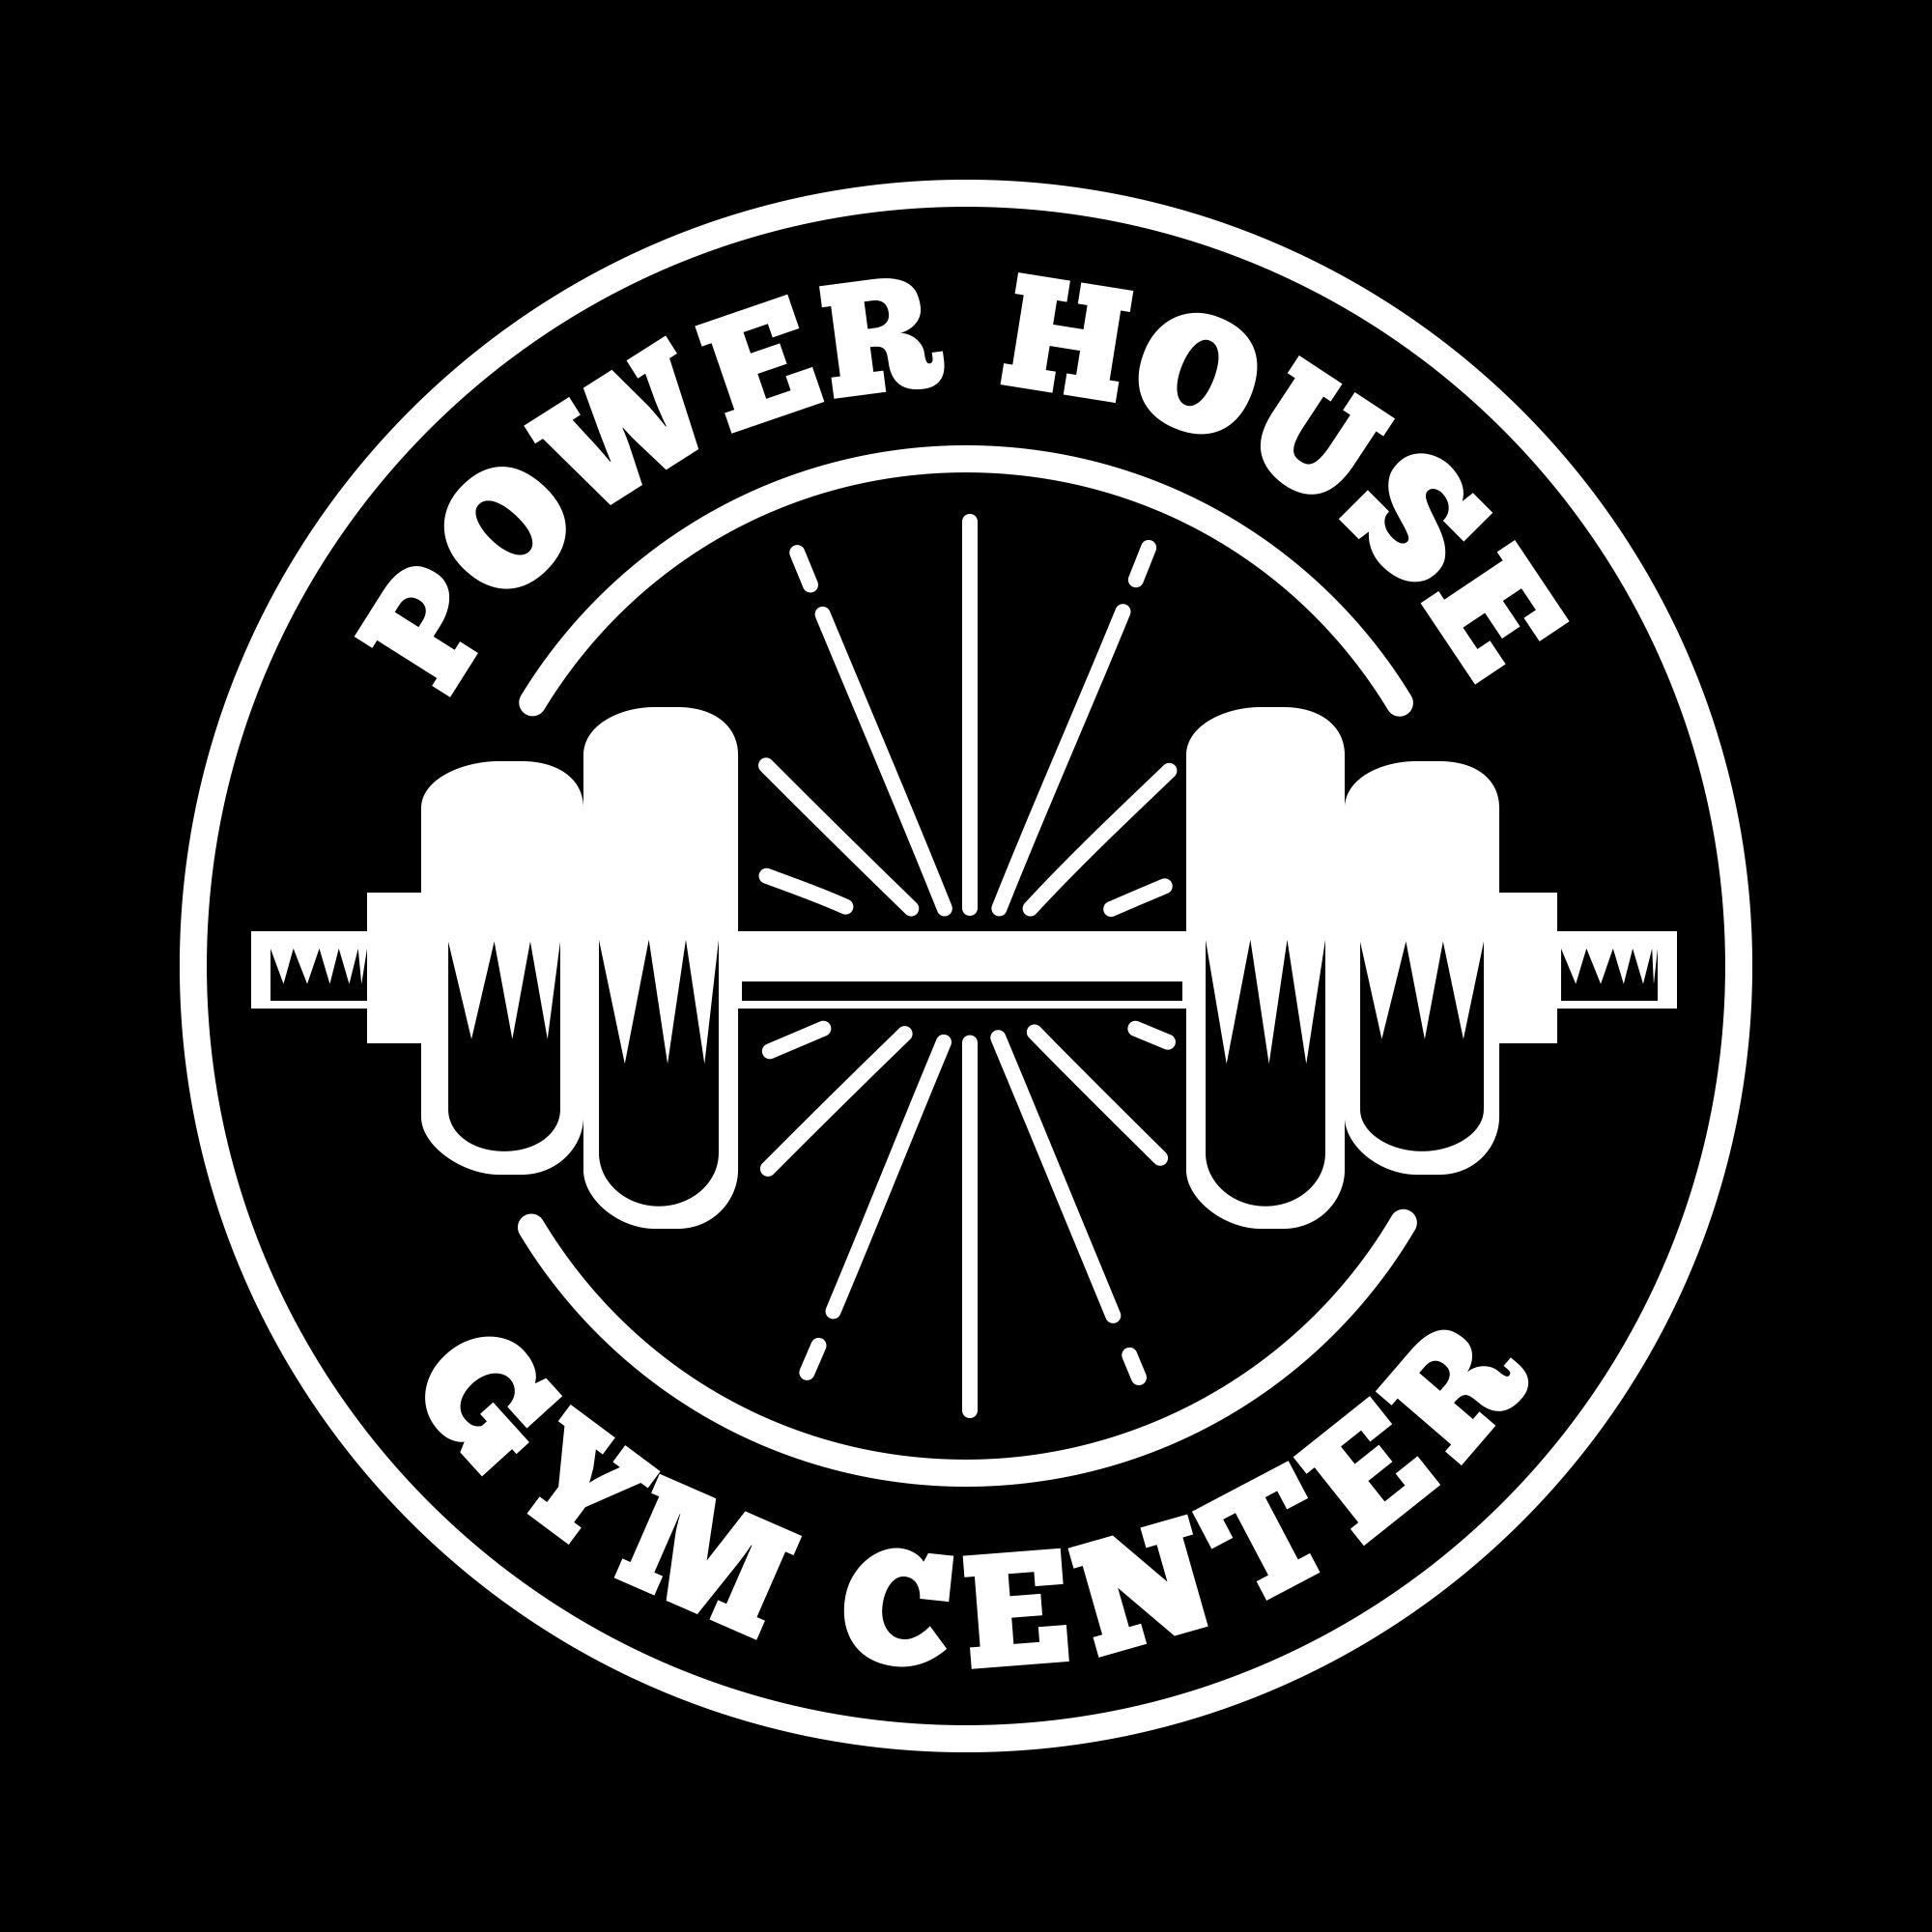 Fitness Logos: Fitness Vintage Badge & Logo - fitness02